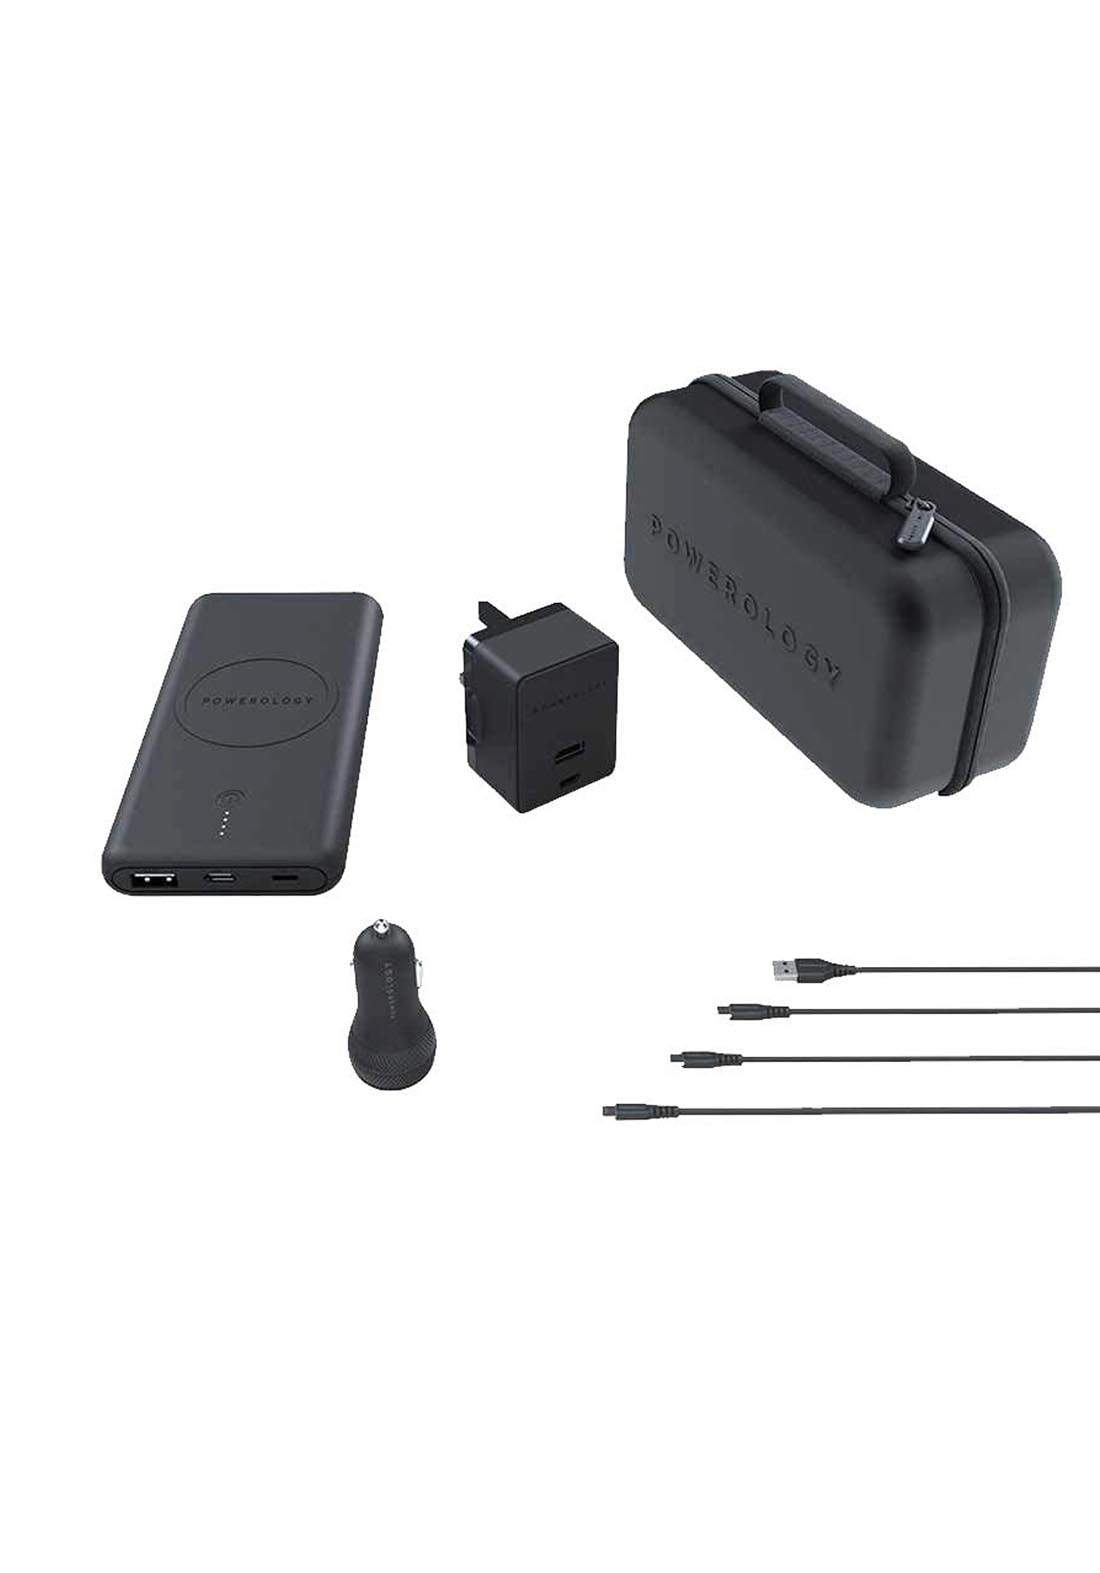 Powerology 8-in-1 Power Delivery Charging Combo - Black  حقيبة من مجموعة شاحنات